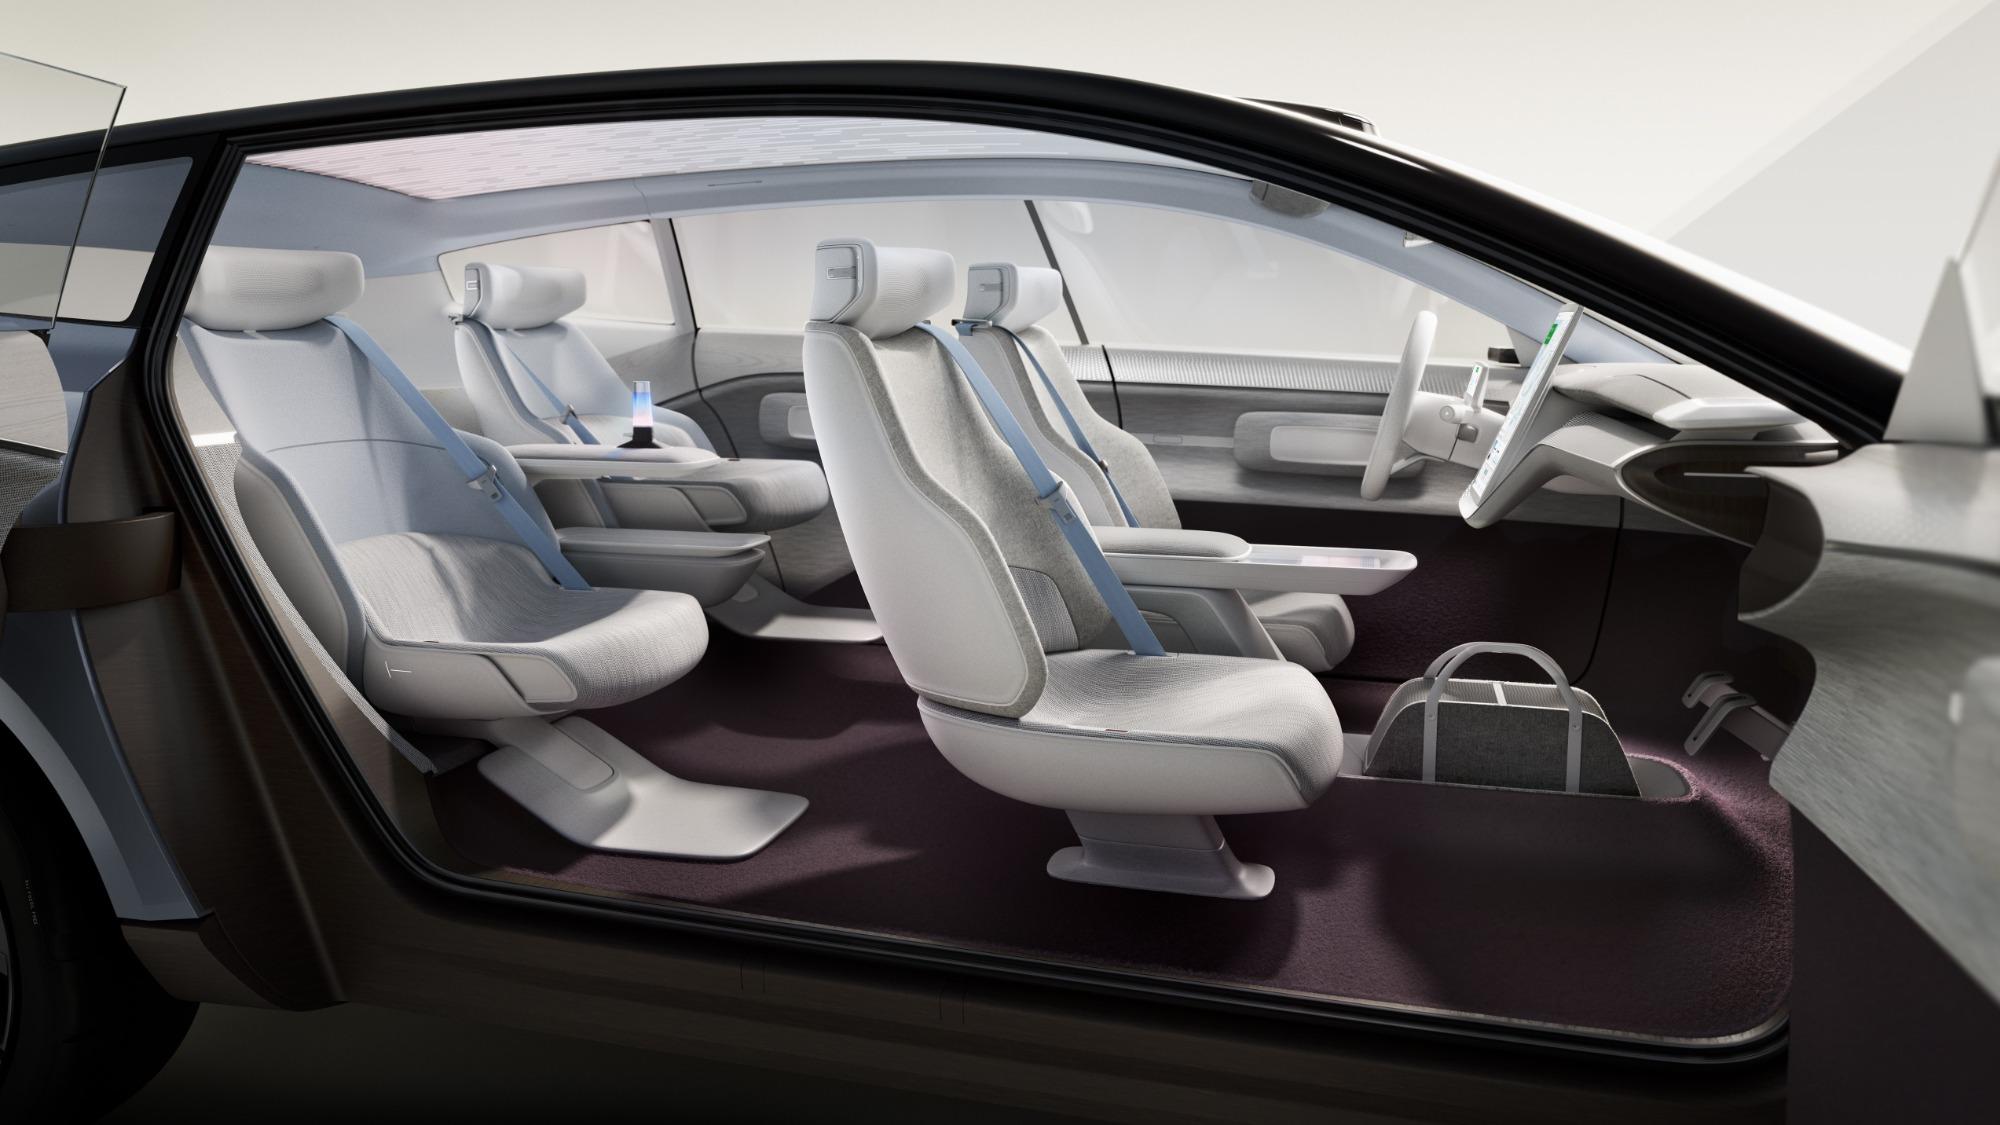 Conceito interno do Volvo Recharge visto de lado